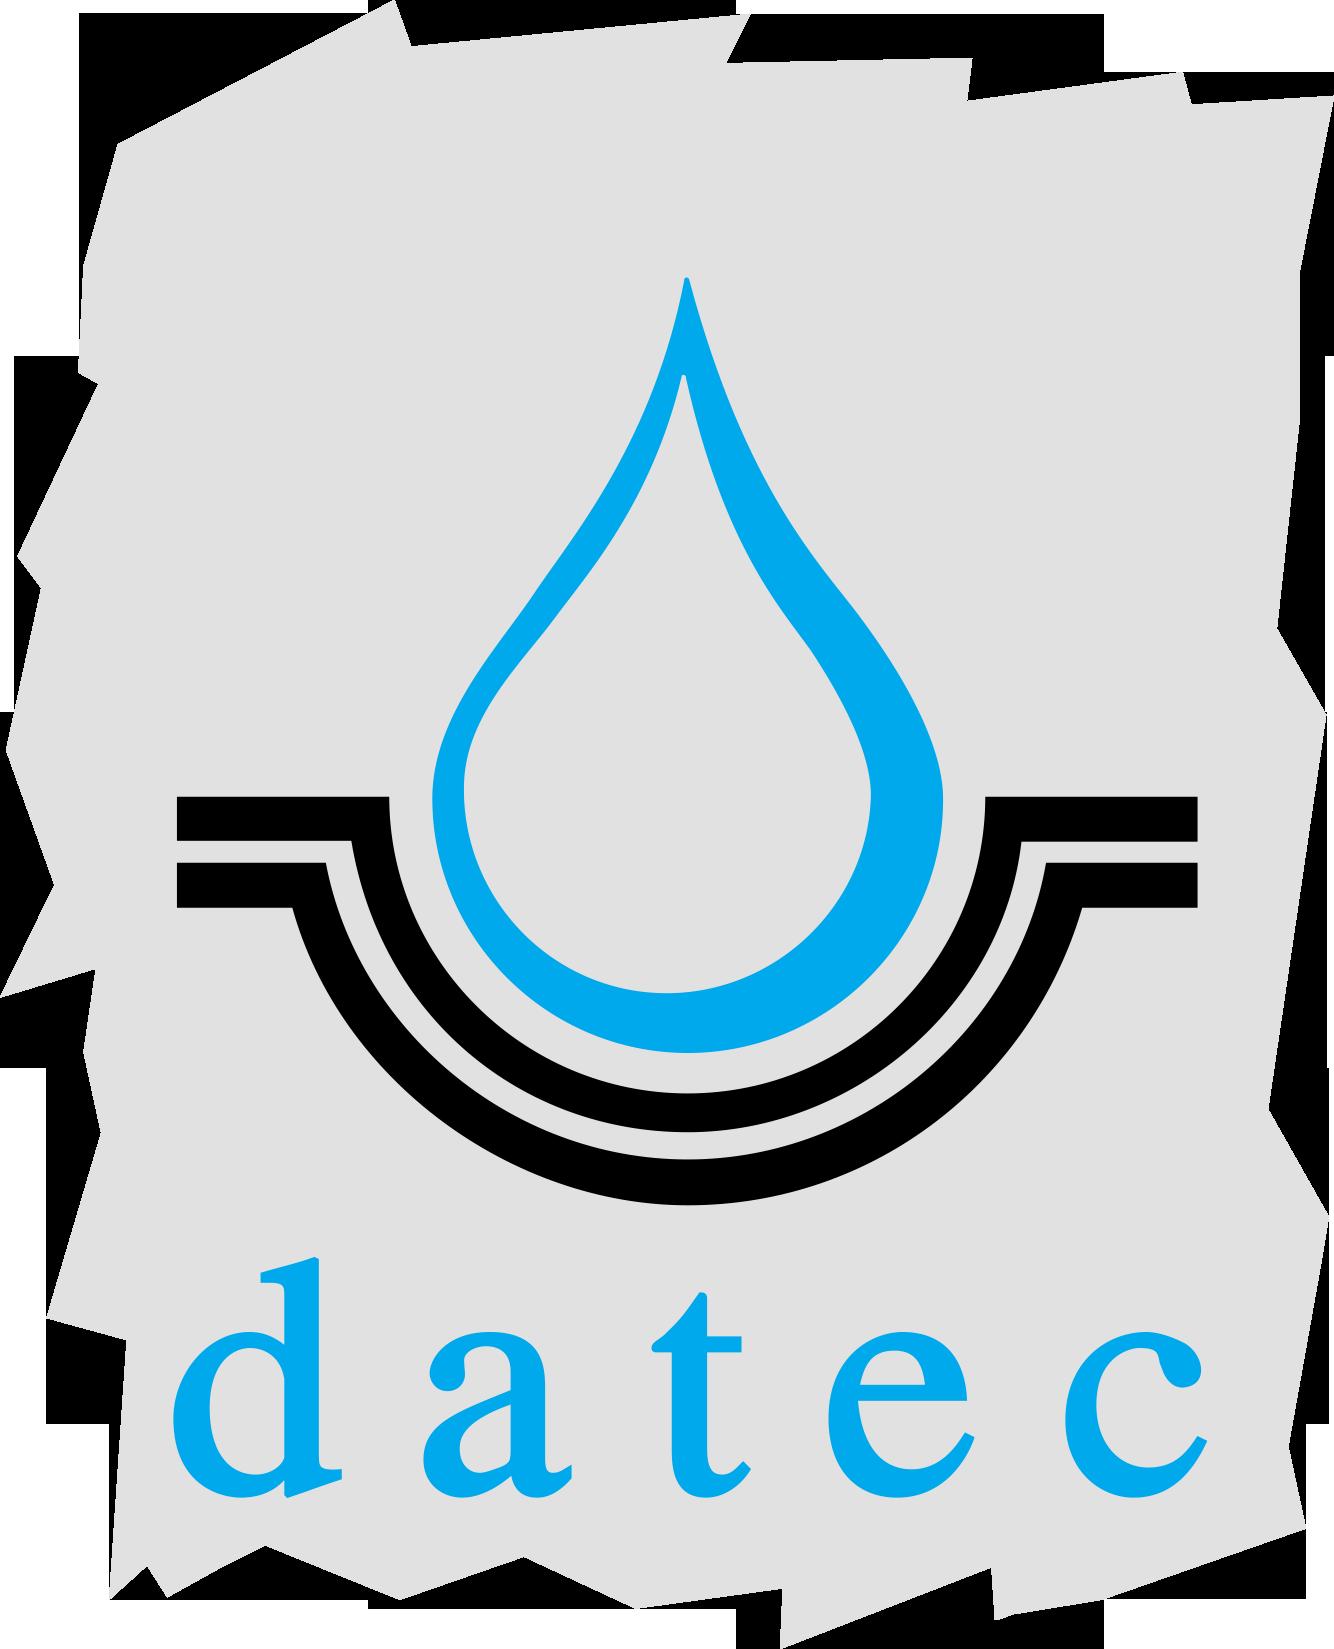 datec - Formstoffmanagement 2020 Logo